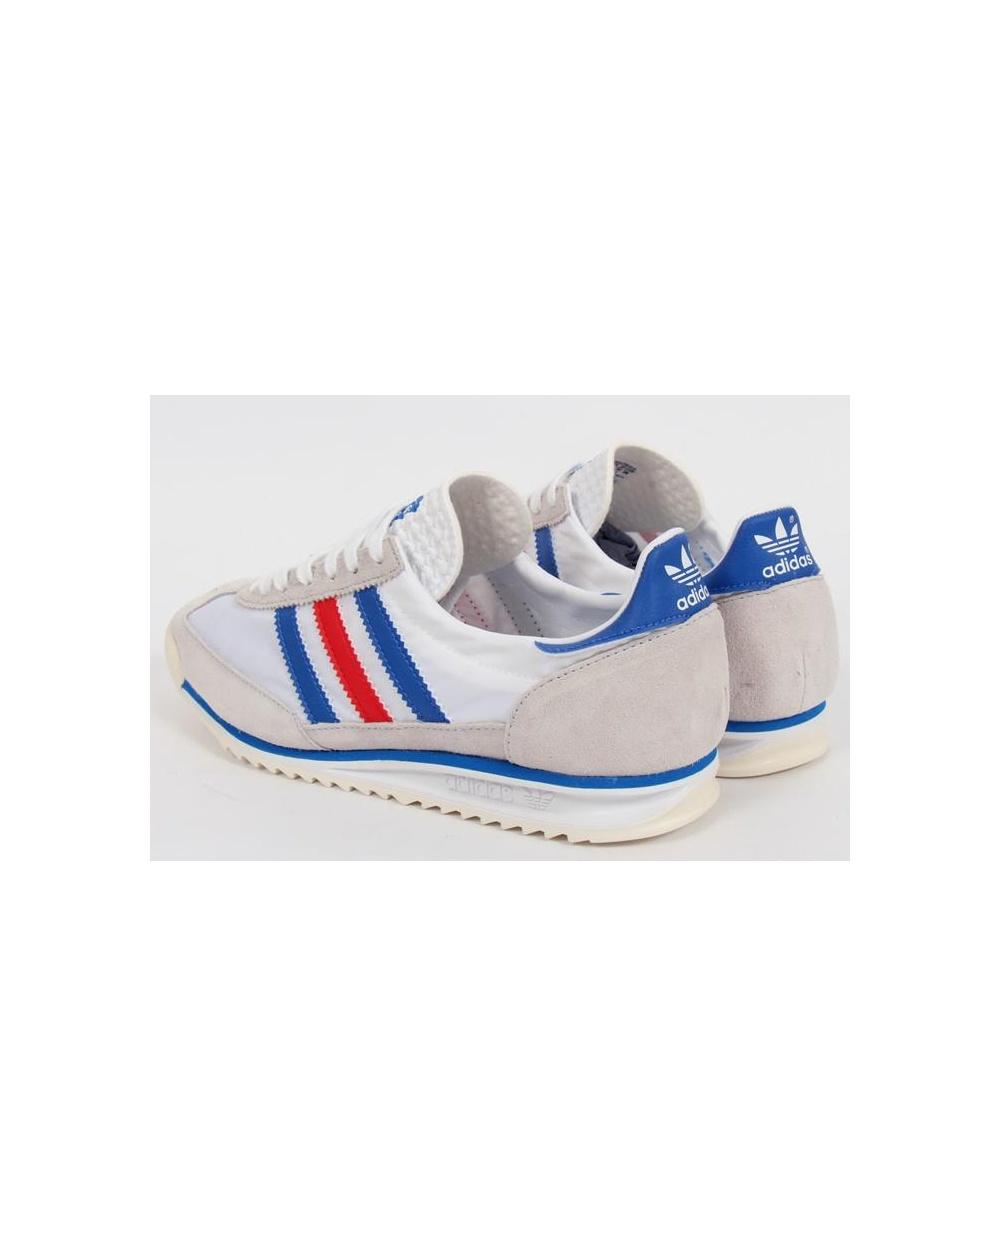 e679a5d951313 sl 72 white adidas sl 72 trainers white blue red p1188 9551_image